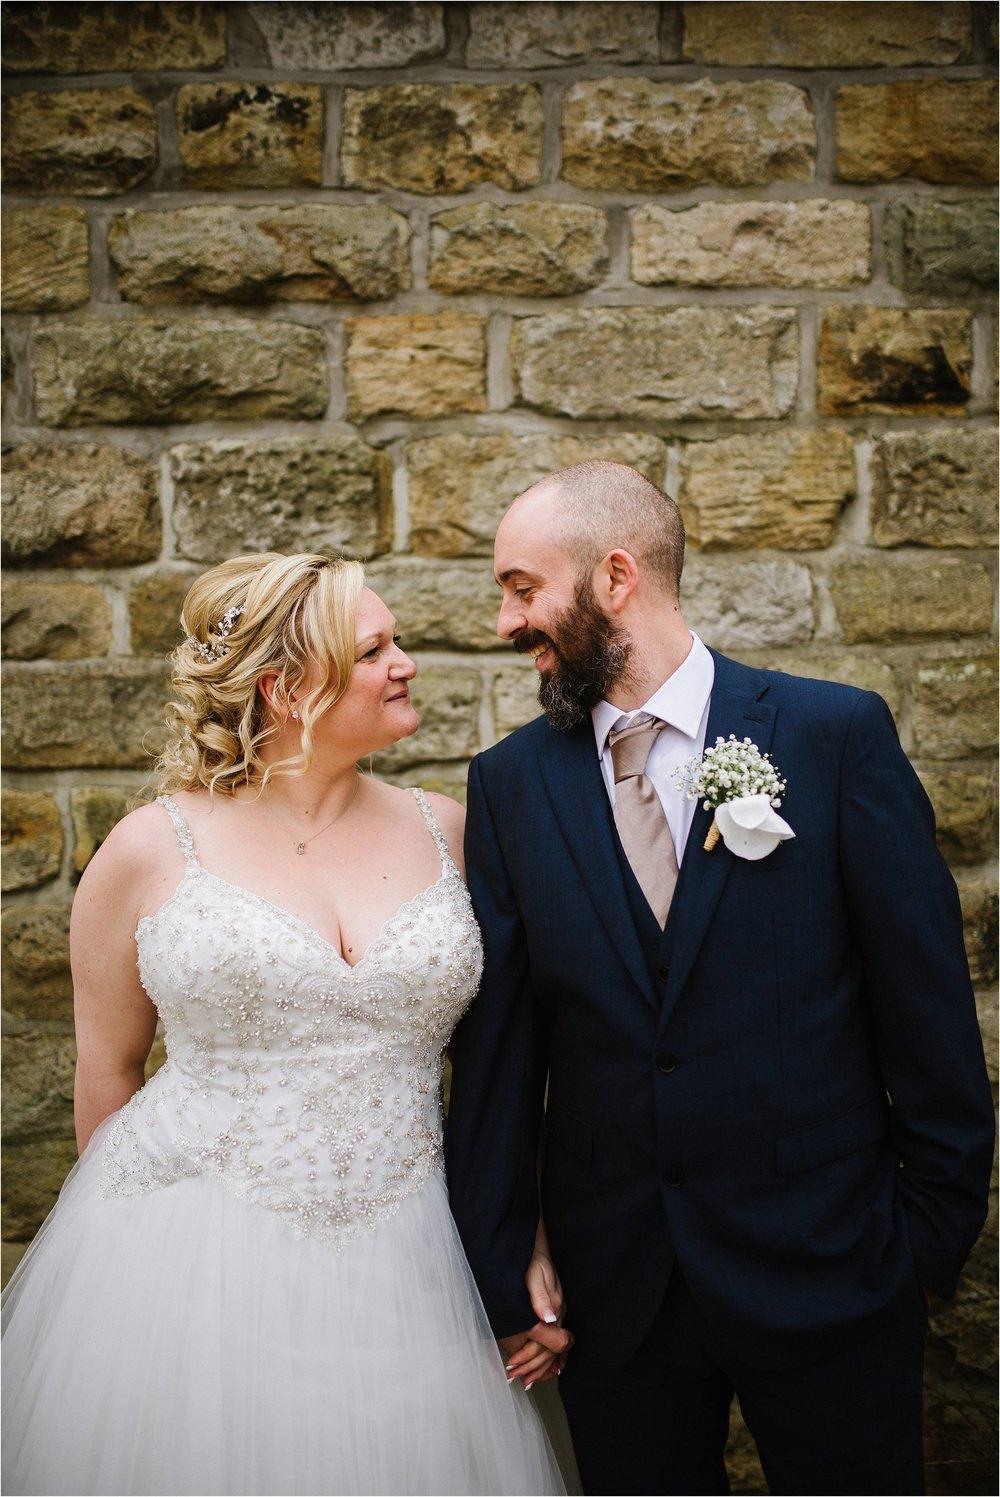 Carly & Ryan Wedding_0044.jpg